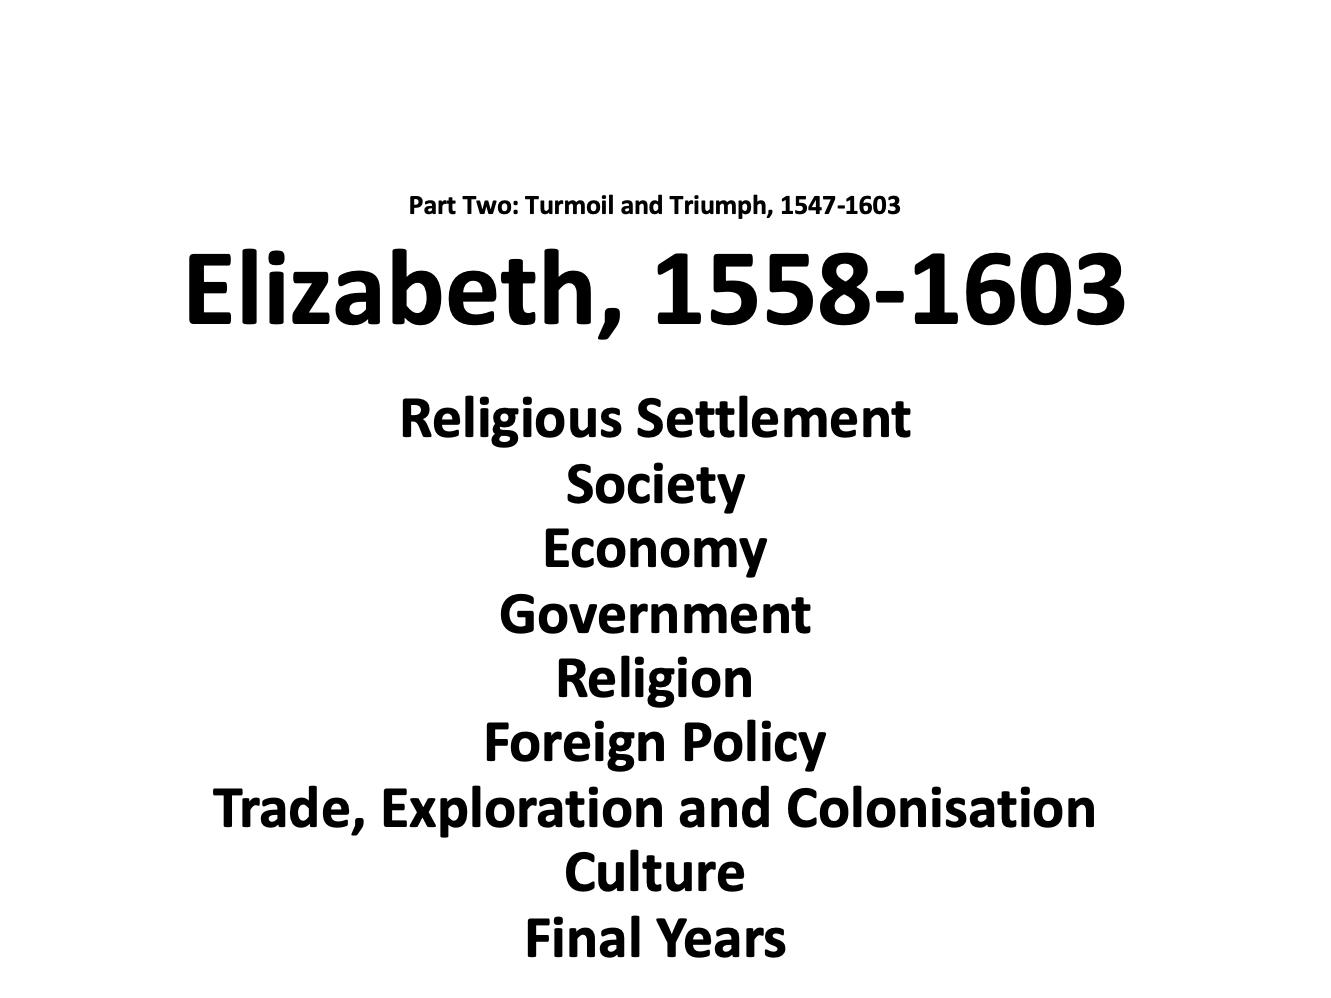 Tudor revision booklets